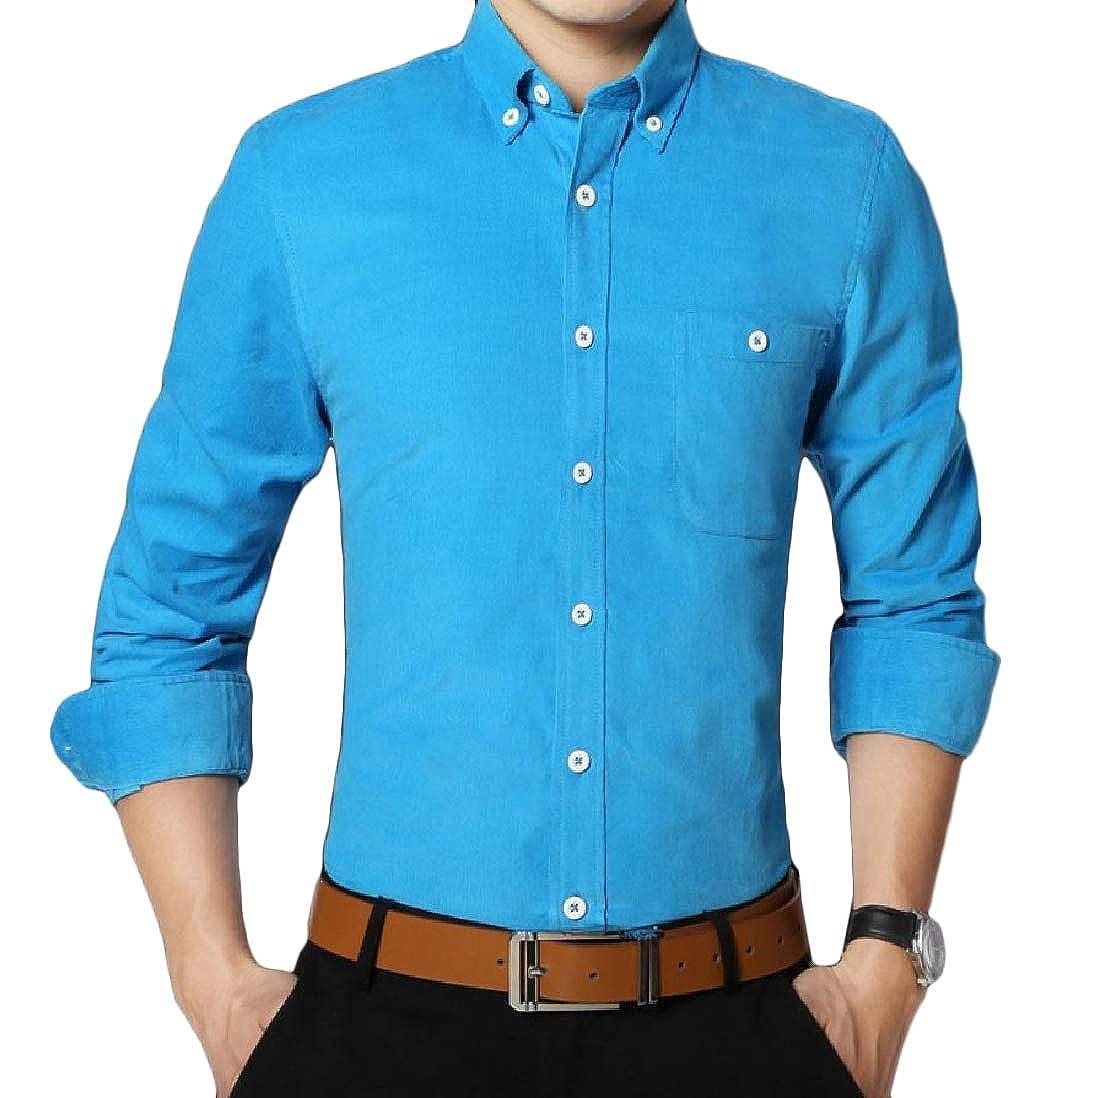 YUNY Mens Button-Down-Shirts Business Corduroy Slim Fitting Shirt Sky Blue 4XL